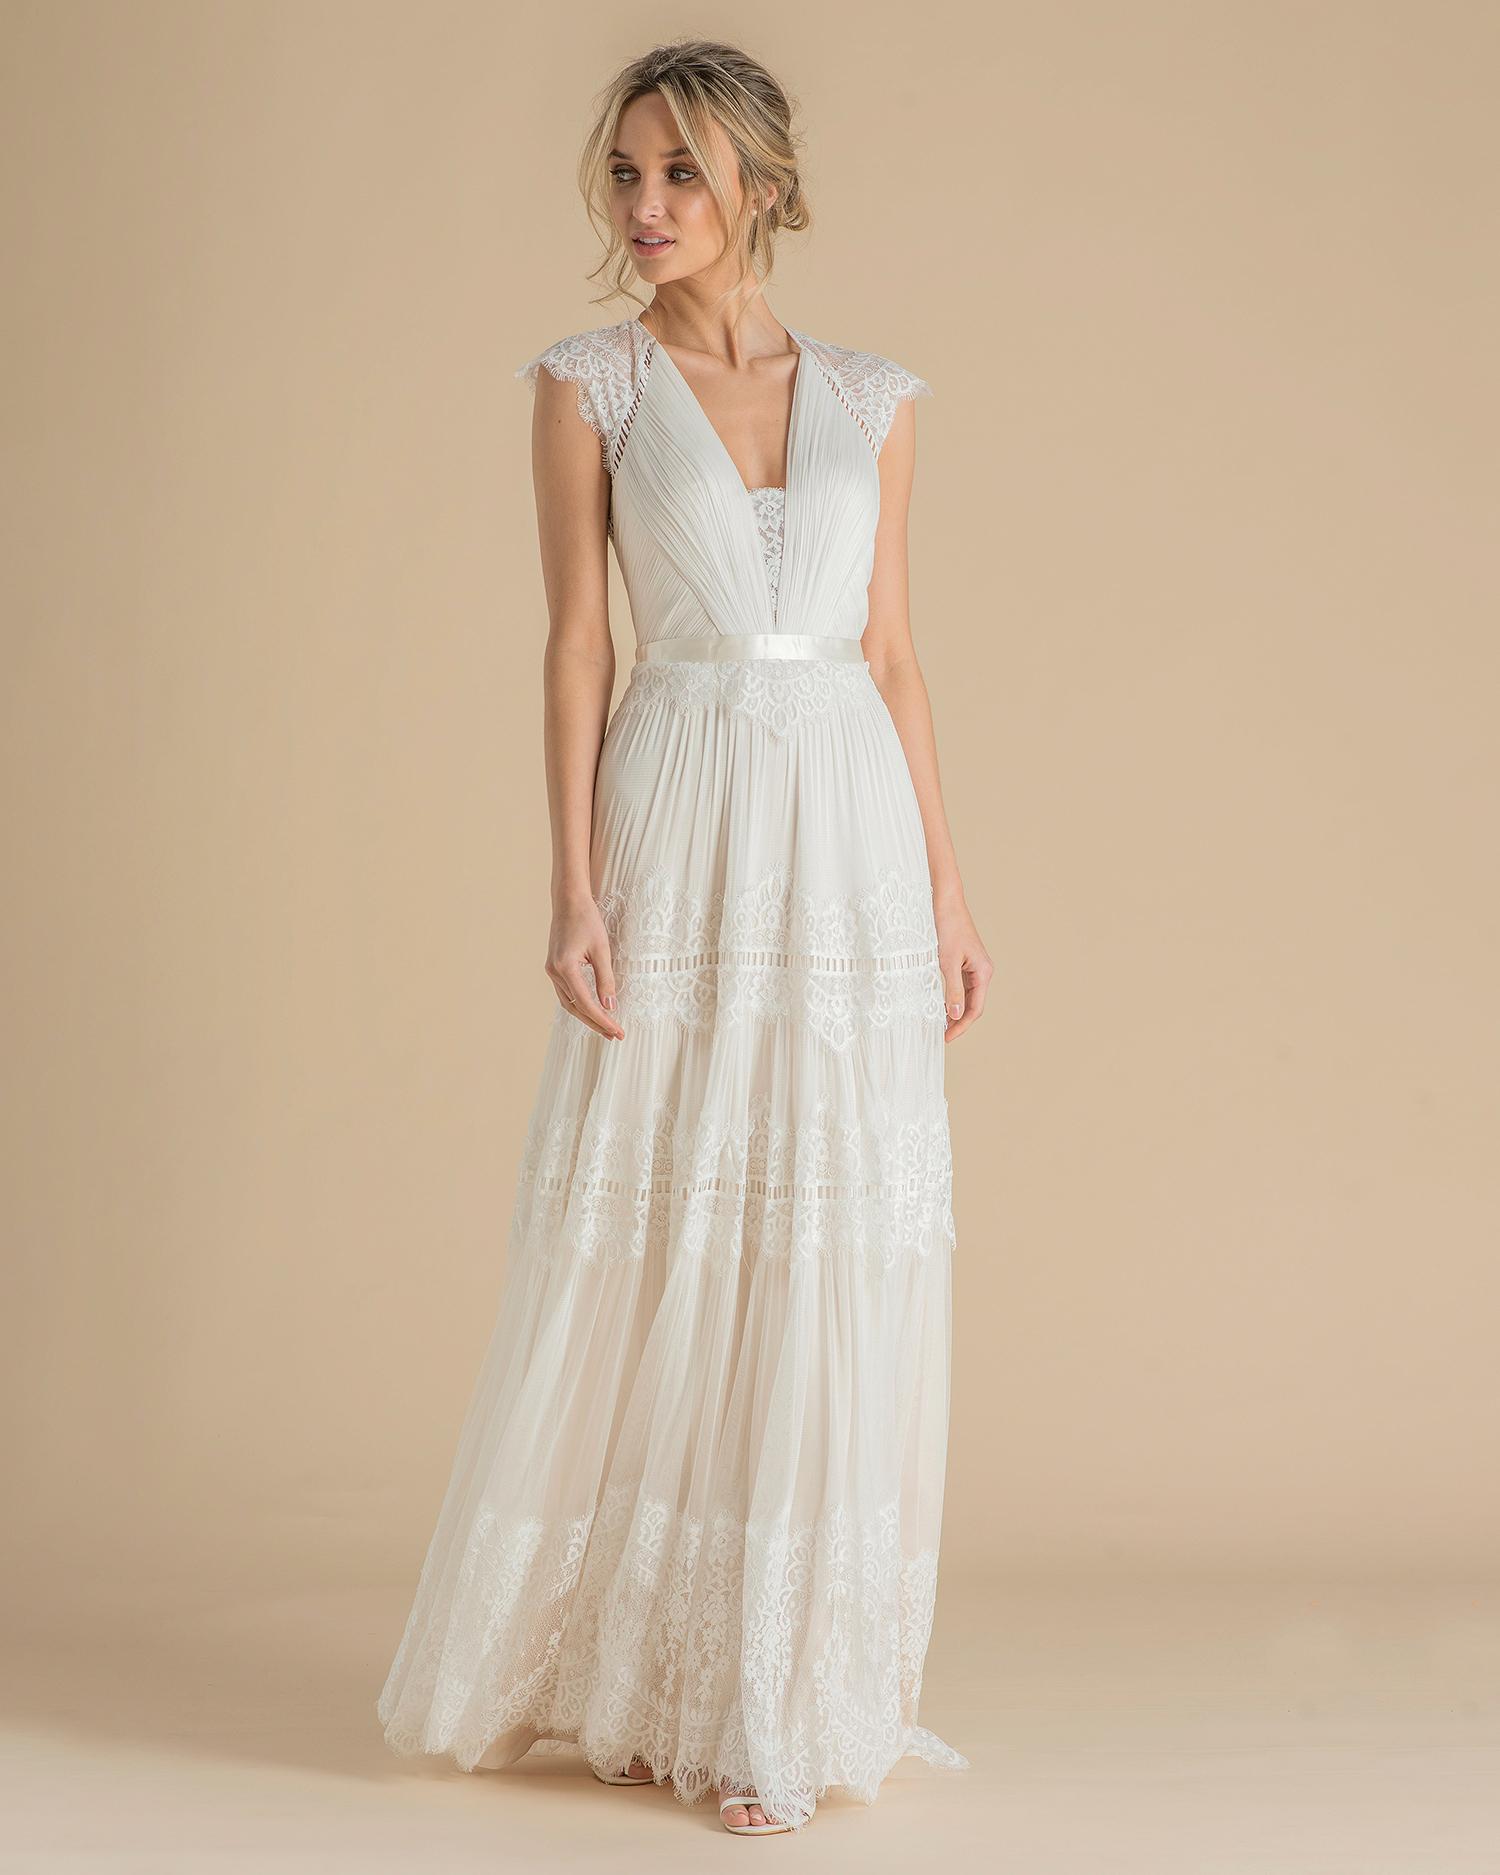 catherine deane wedding dress spring 2019 boho v-neck cap sleeve